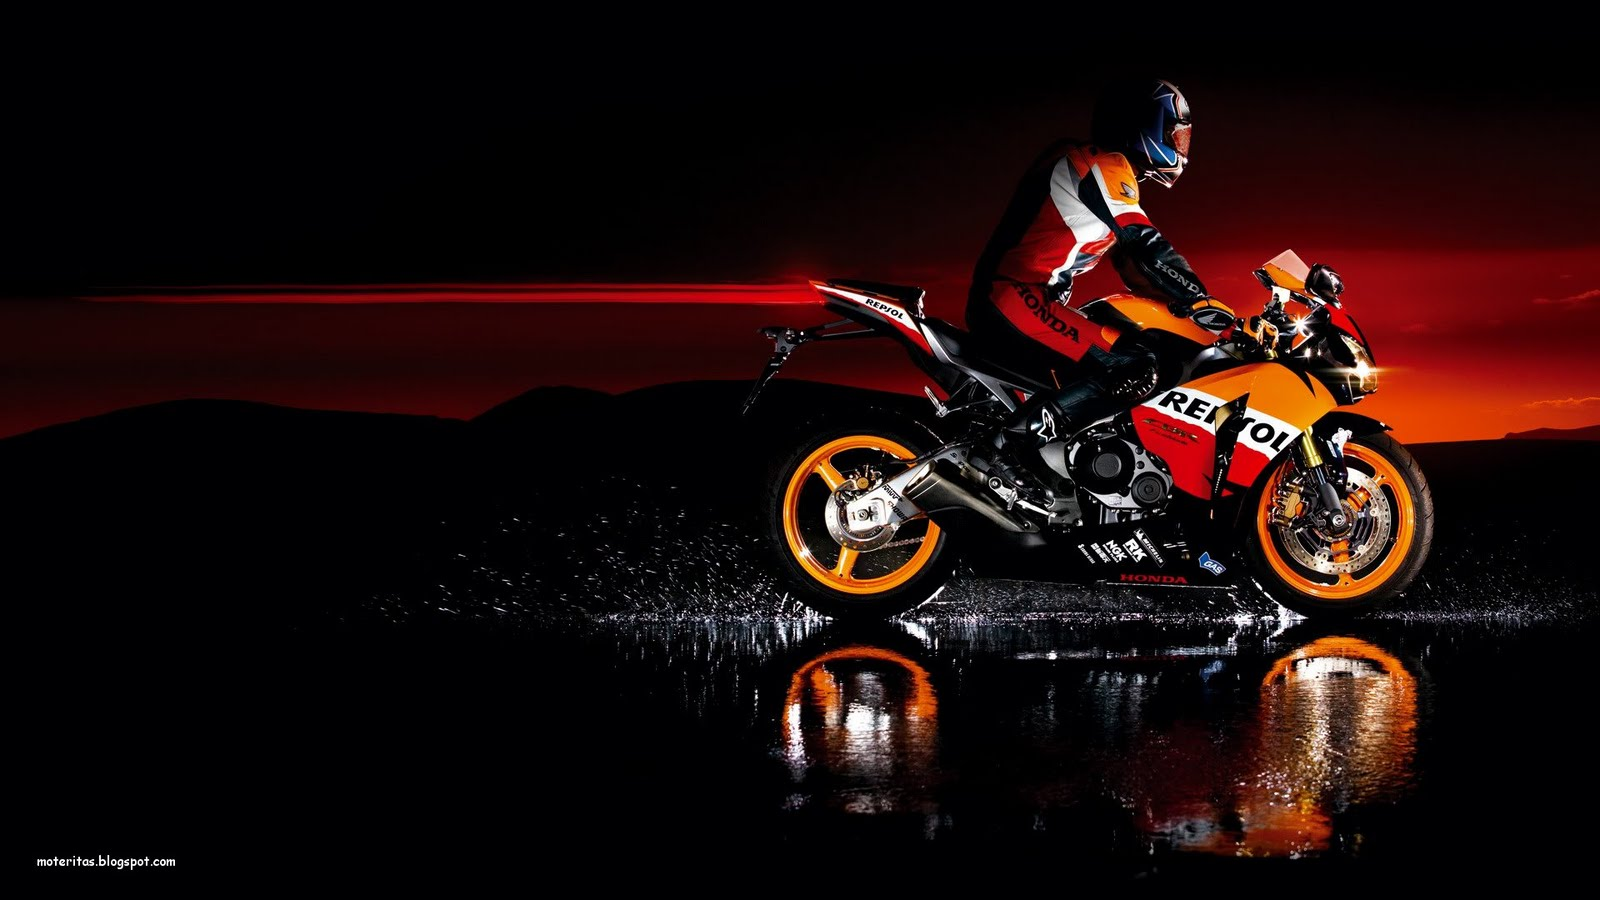 Honda Cbr Motorcycle 4k Hd Desktop Wallpaper For 4k Ultra: Motos Y Mujeres Resolución HD: Honda CBR1000RR Motorcycle